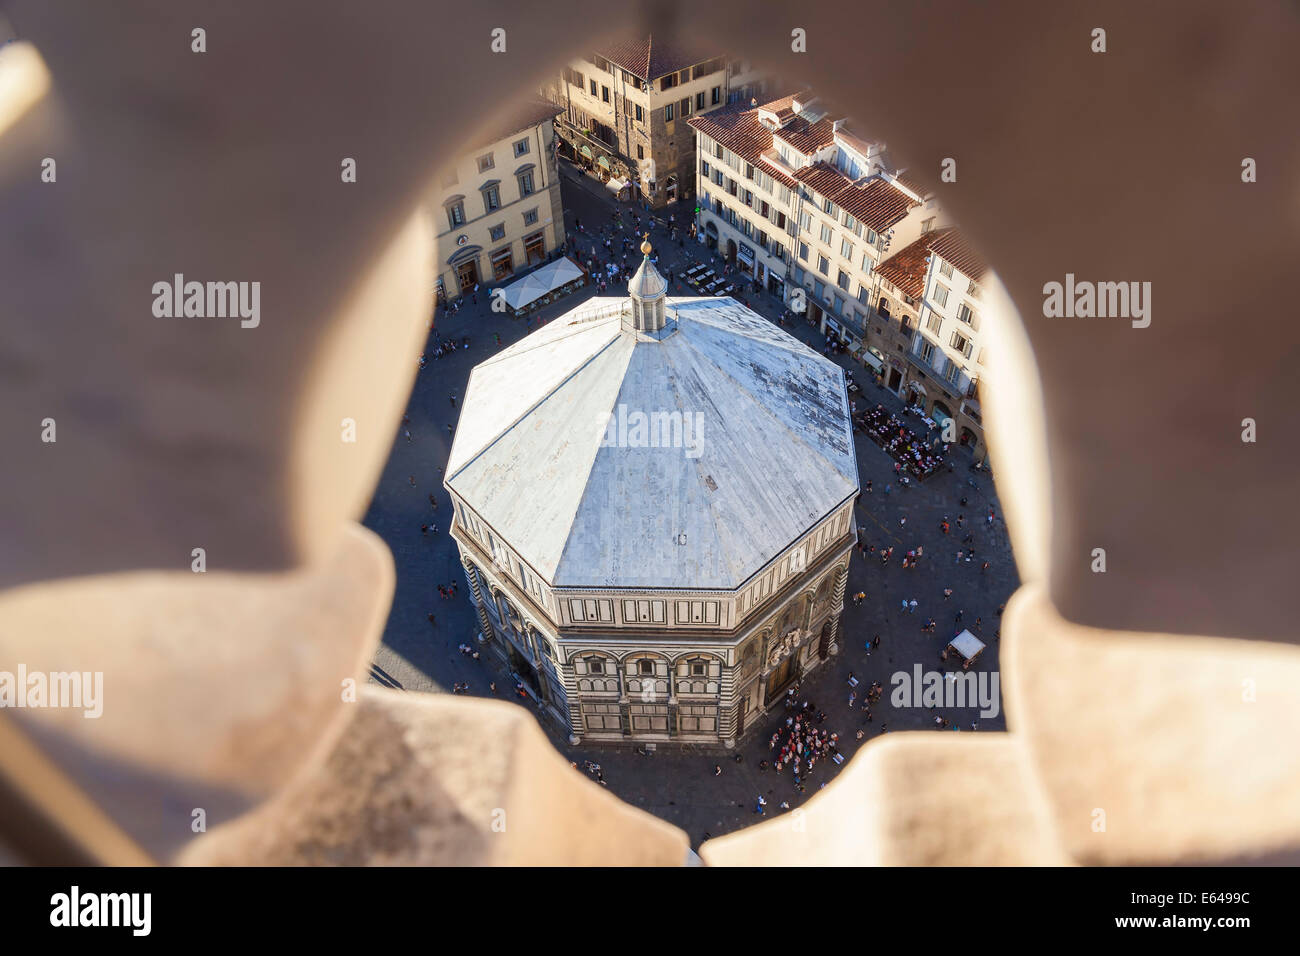 Baptistère de la Piazza del Duomo, Florence, Italie Photo Stock